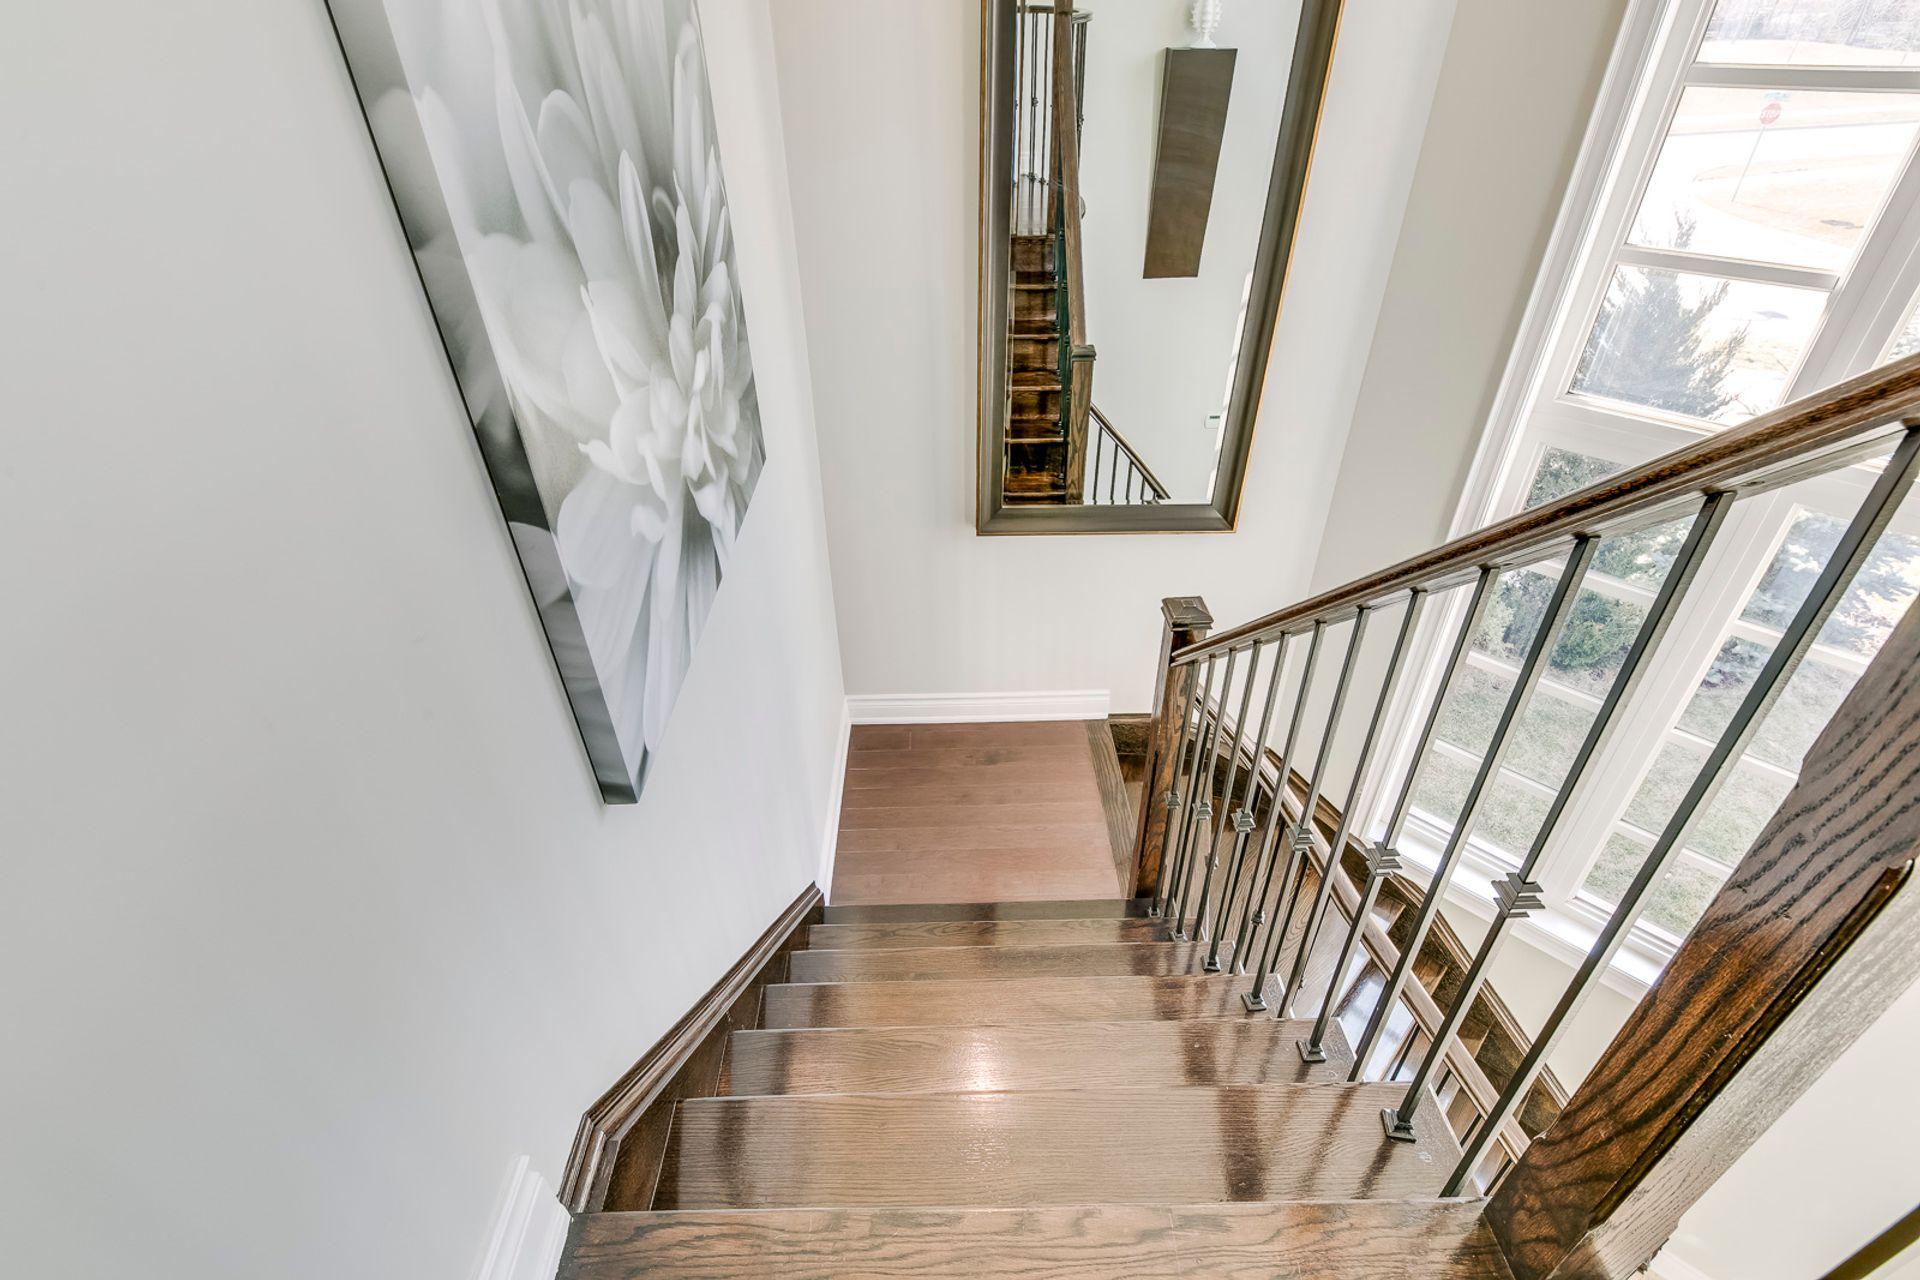 Staircase - 2419 Sylvia Dr, Oakville - Elite3 & Team at 2419 Sylvia Drive, Iroquois Ridge North, Oakville